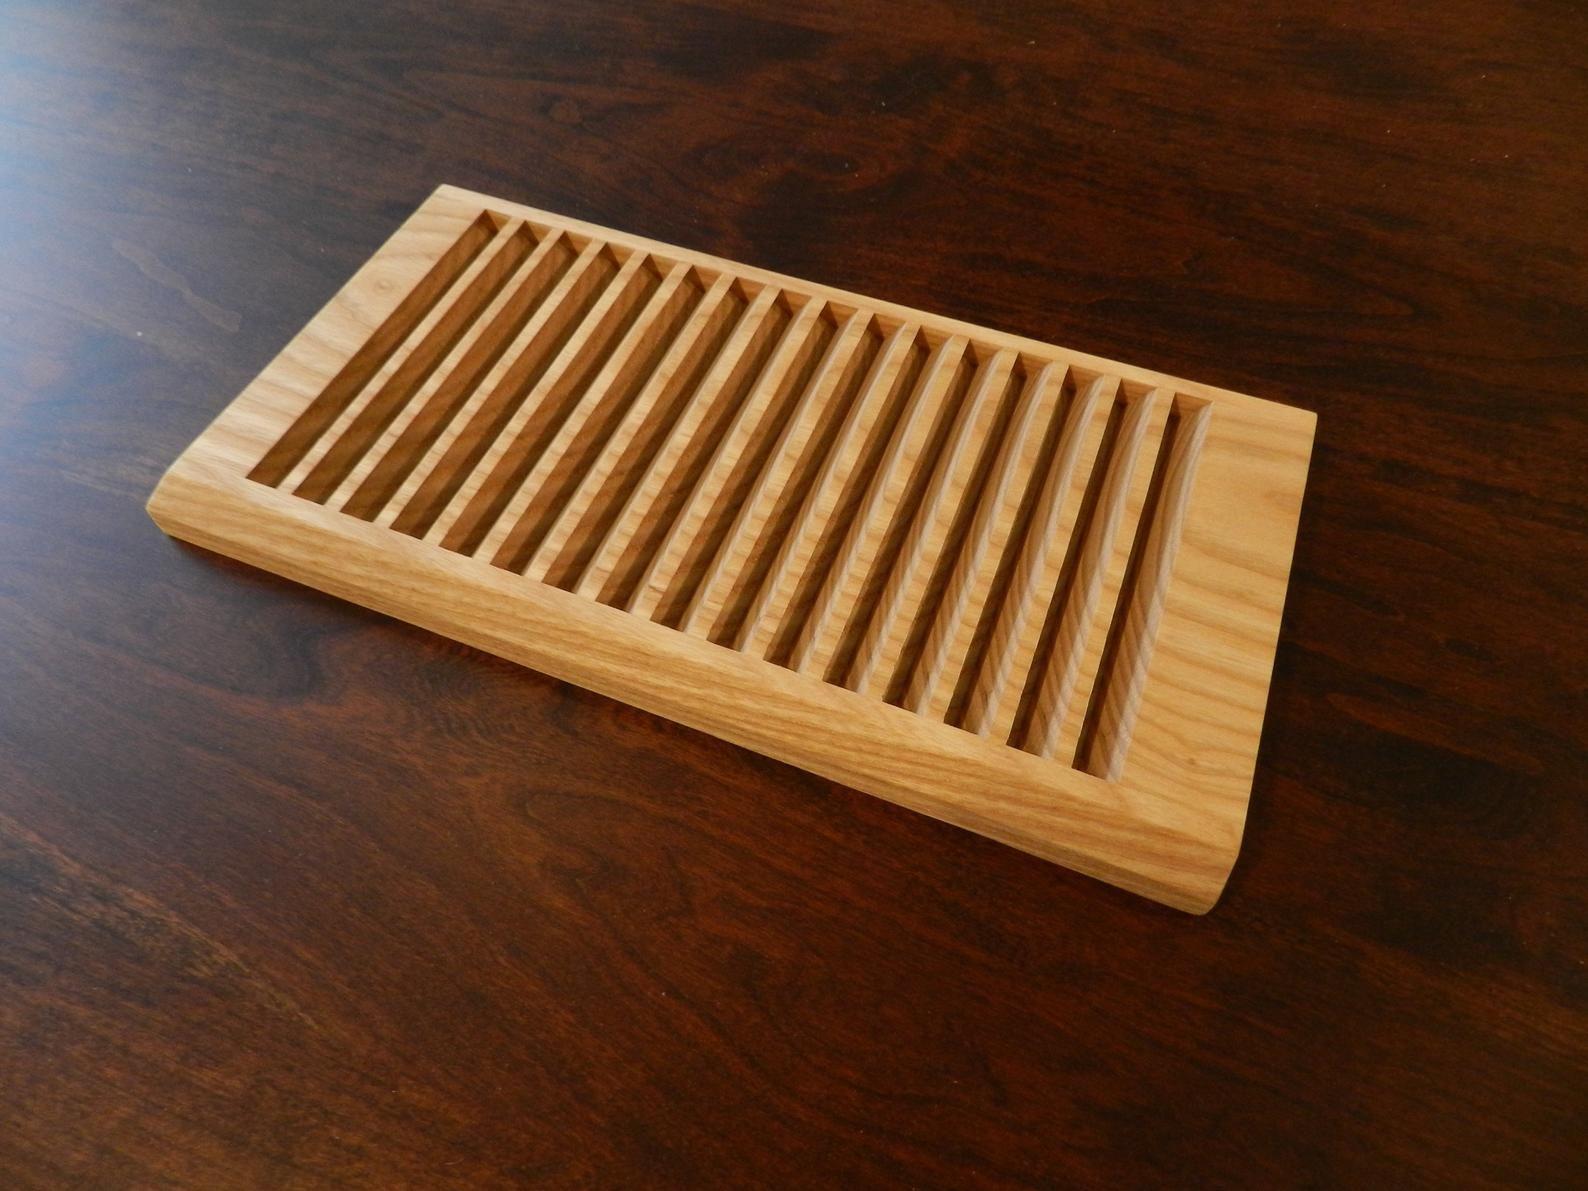 Plate Rack-Mahogany Wood-for Vertical Plate Storage #plateracks